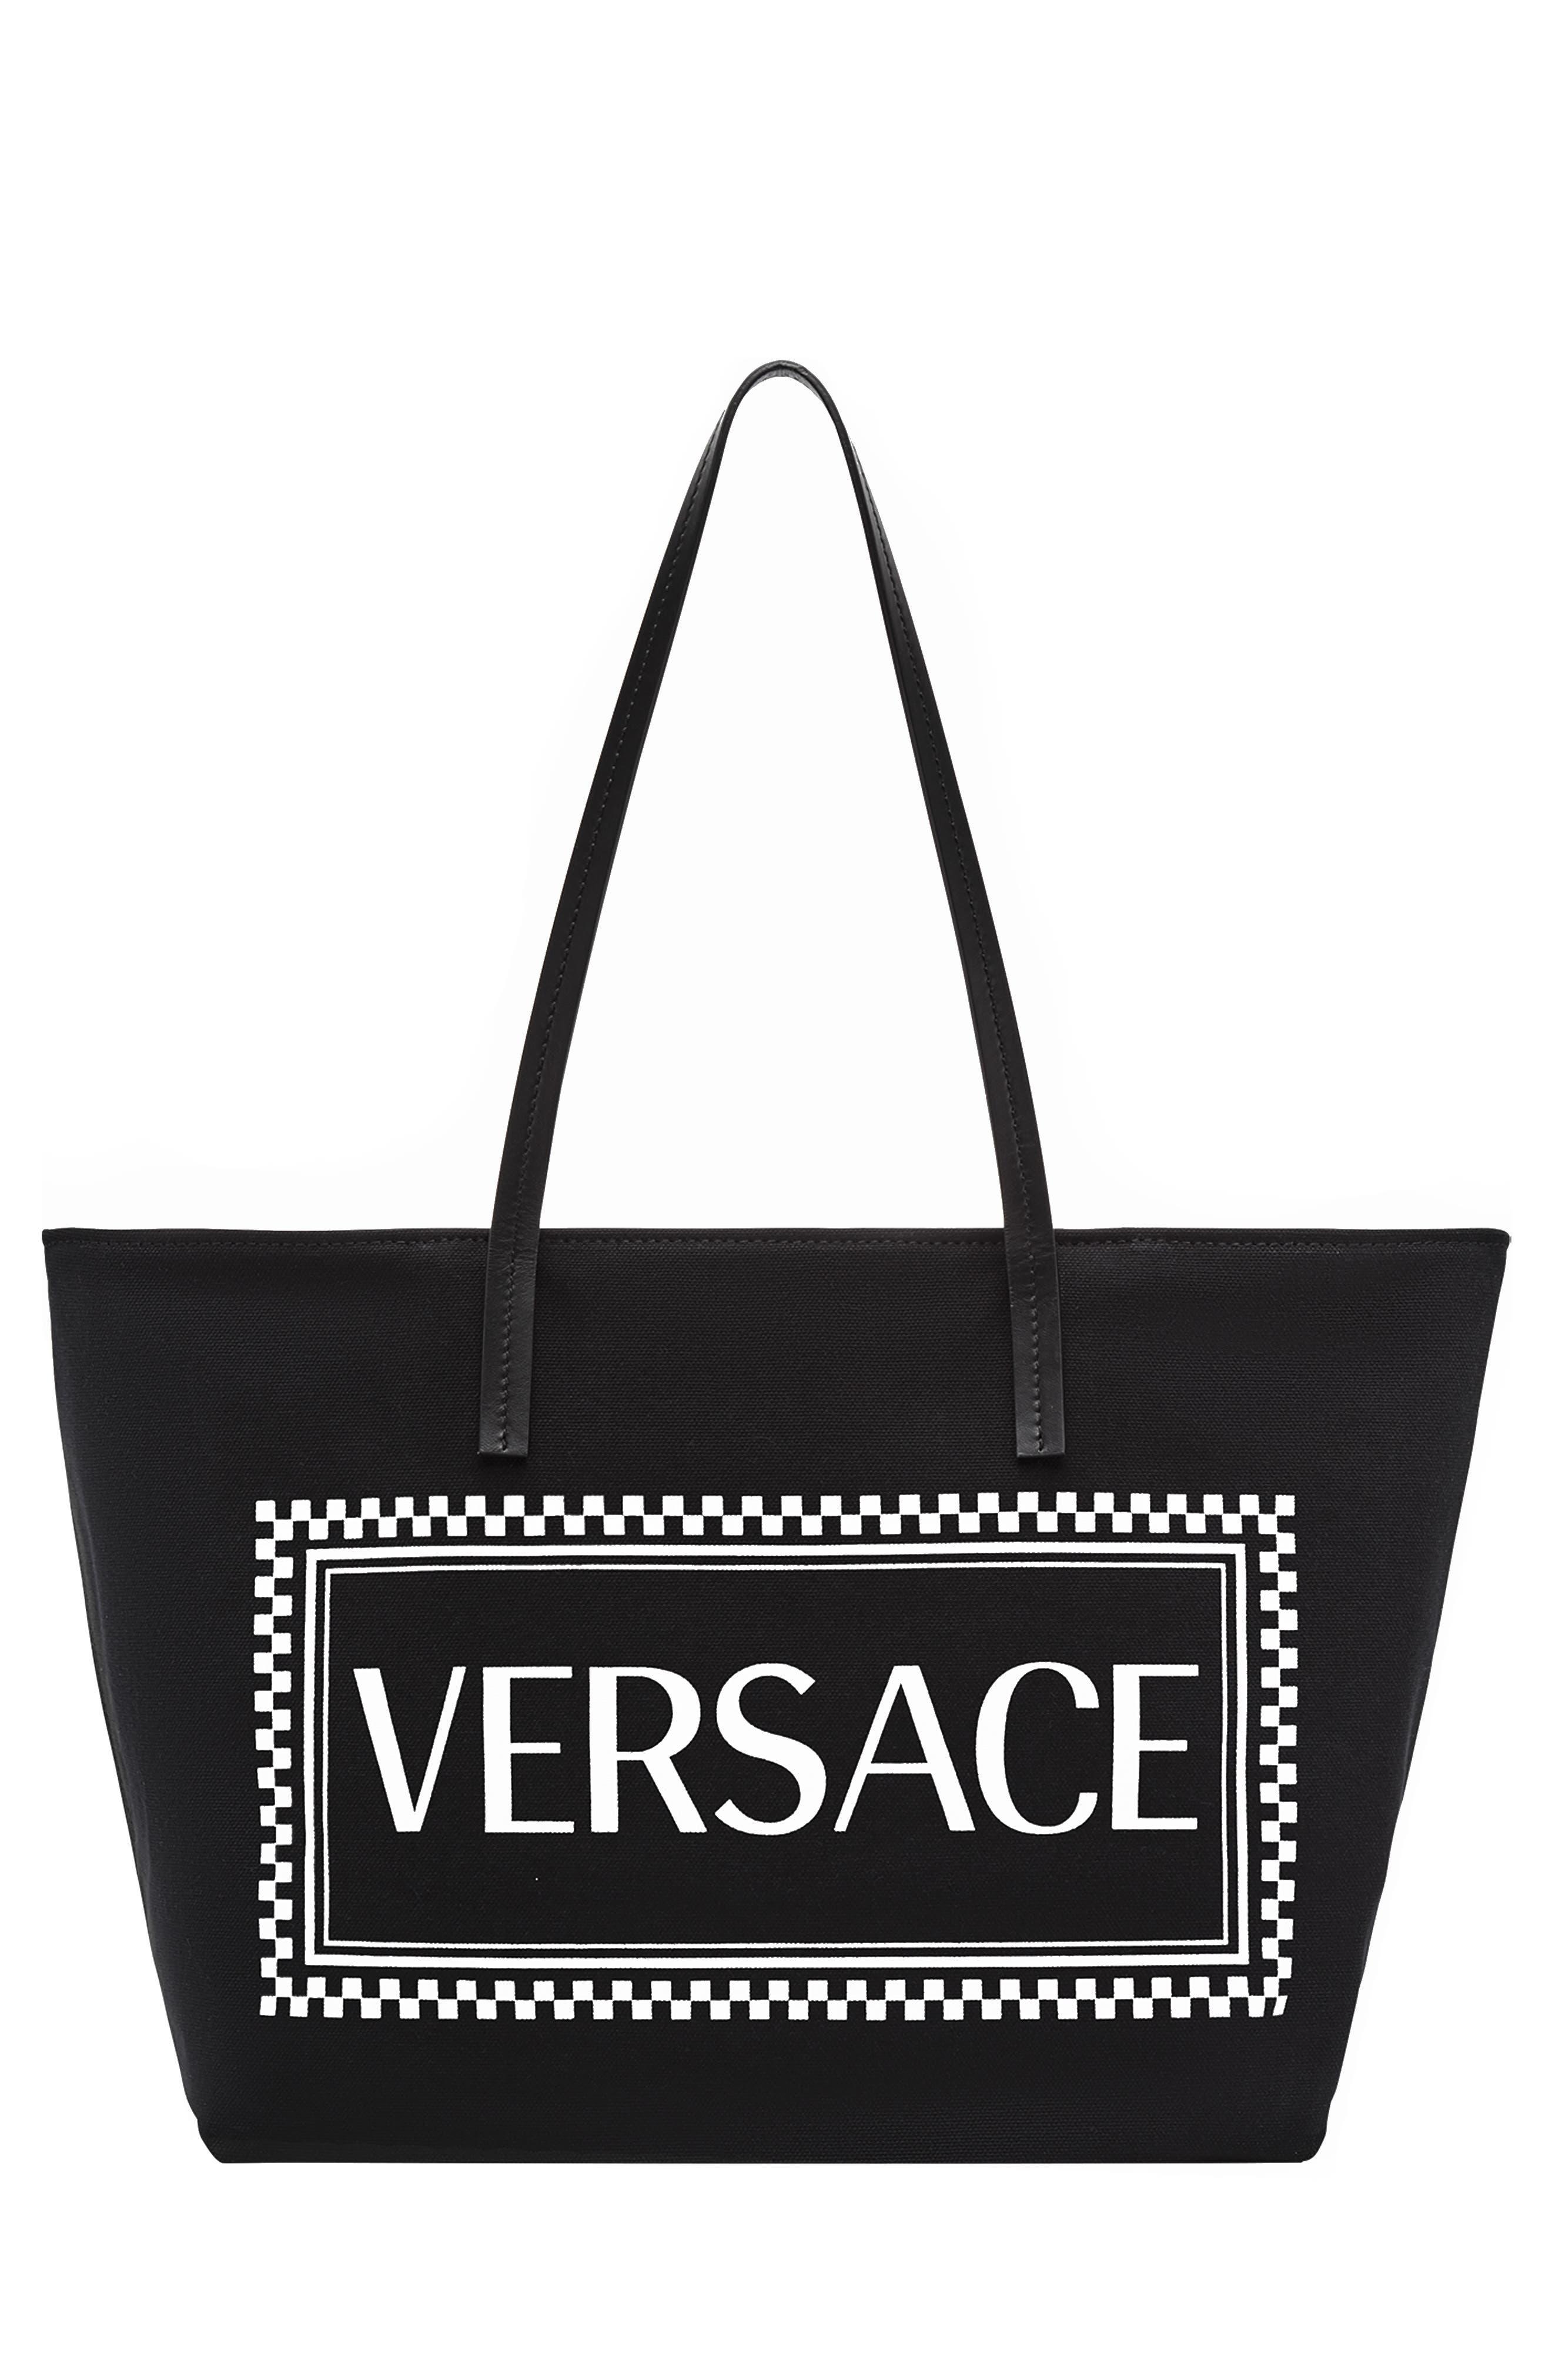 7db6bbd3fa Versace Handbags   Purses